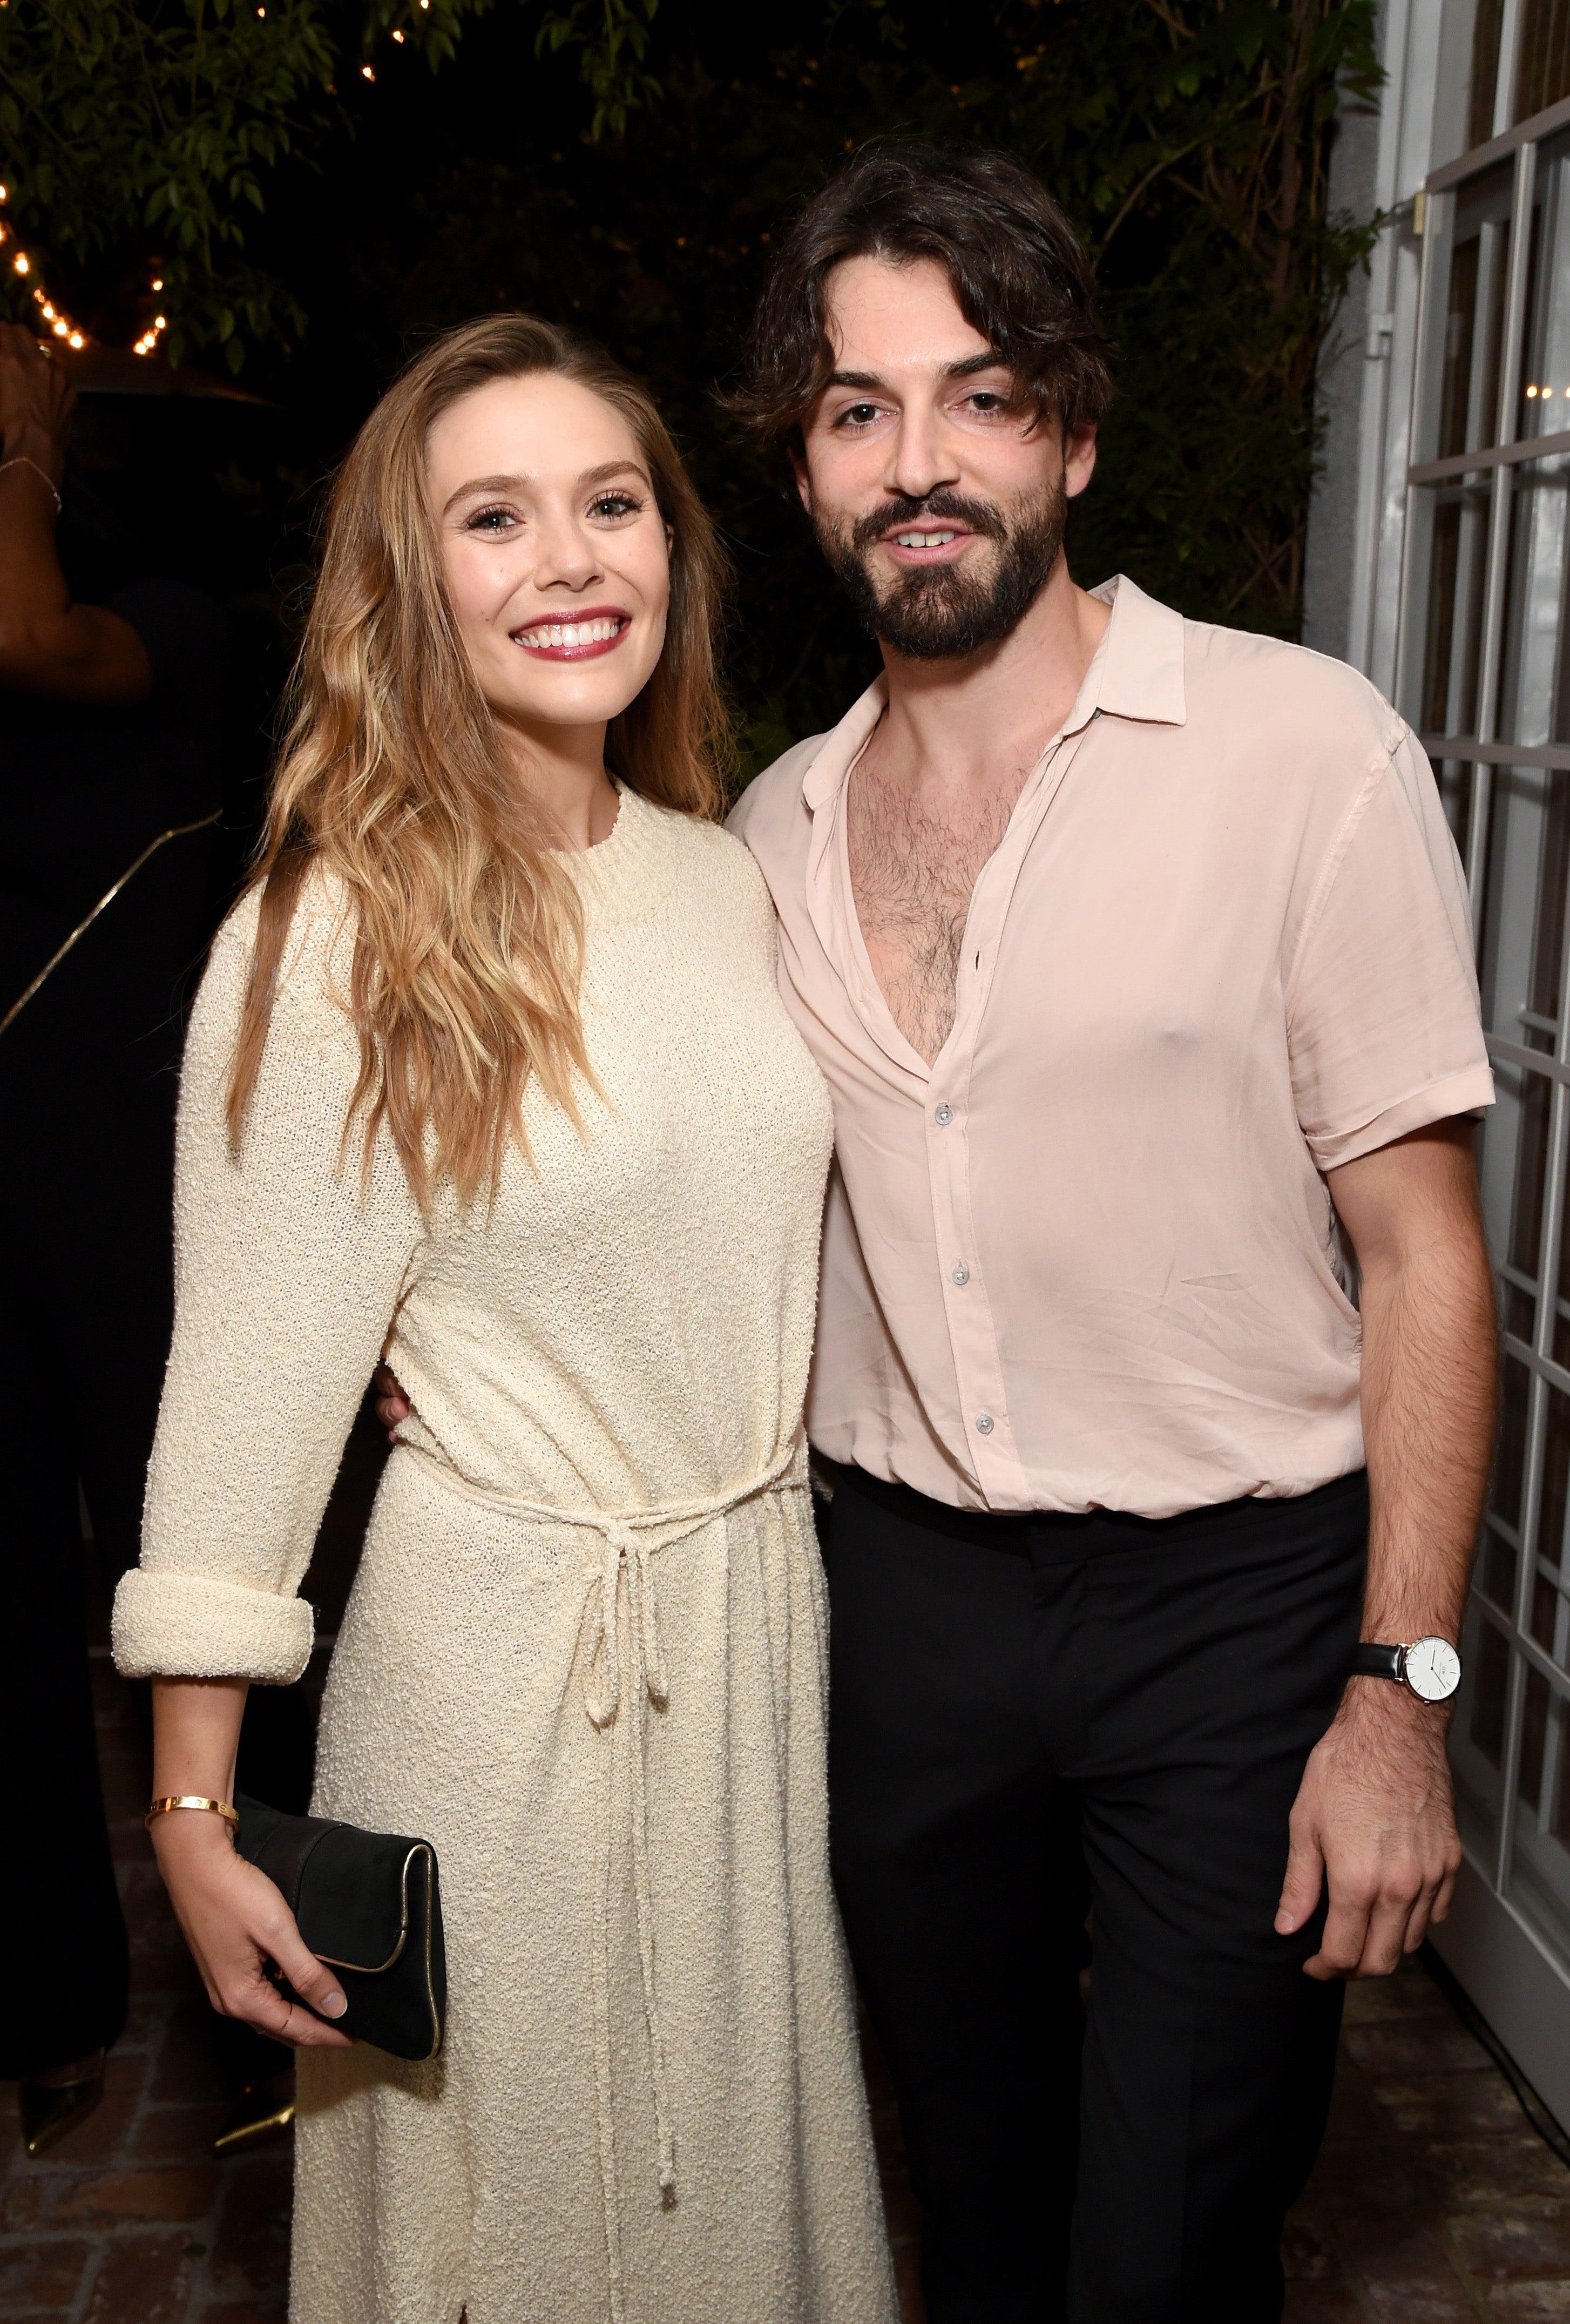 Elizabeth Olsen Flashes a Big Smile With Boyfriend Robbie